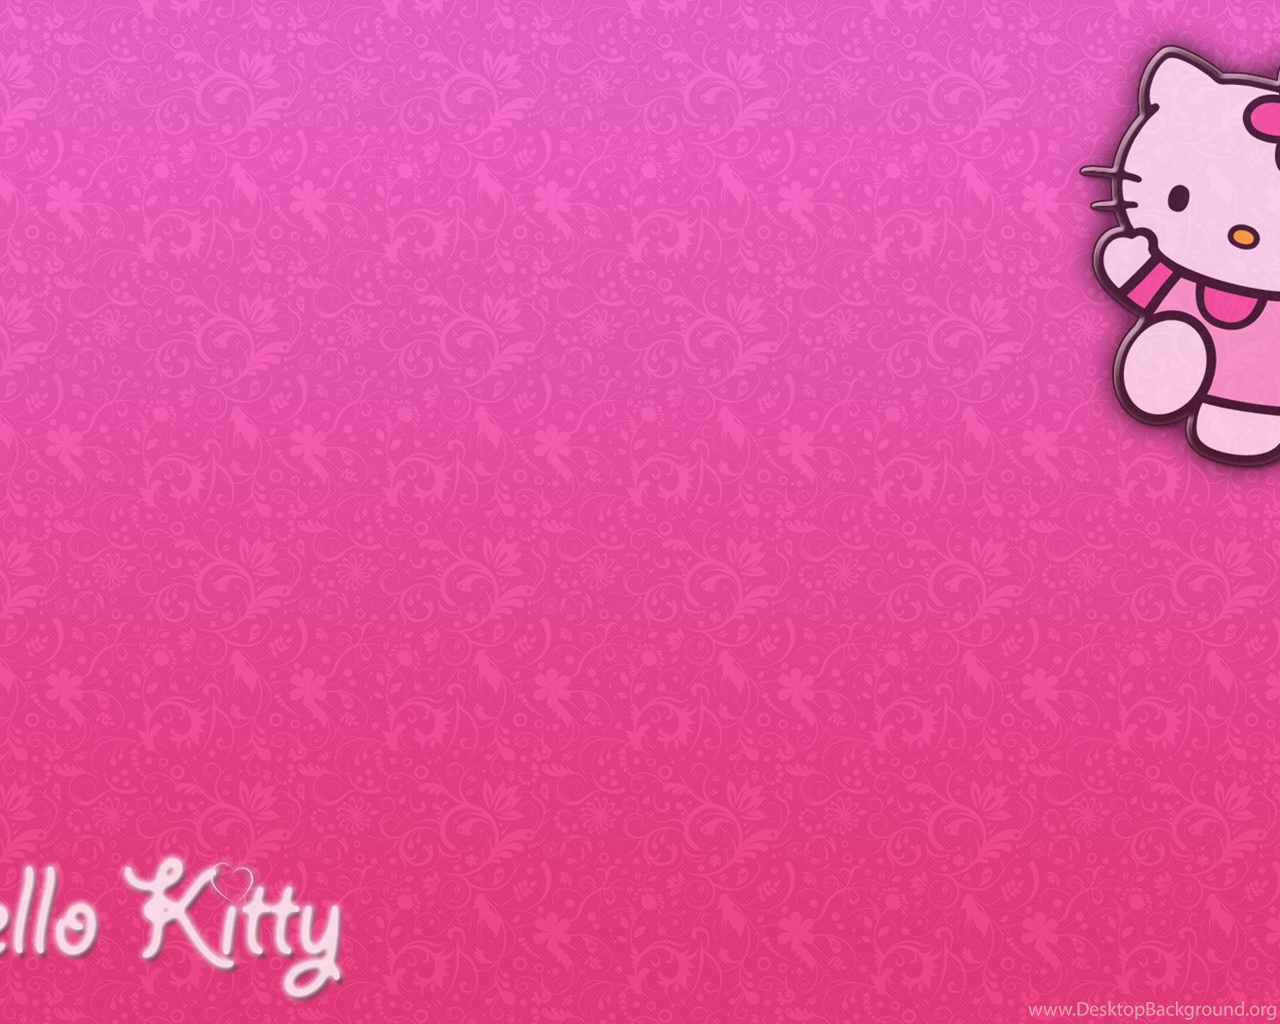 Wonderful Wallpaper Hello Kitty Note 5 - 531152_hd-wallpapers-hello-kitty-wallpapers-cave_1680x1050_h  Collection_661094.png